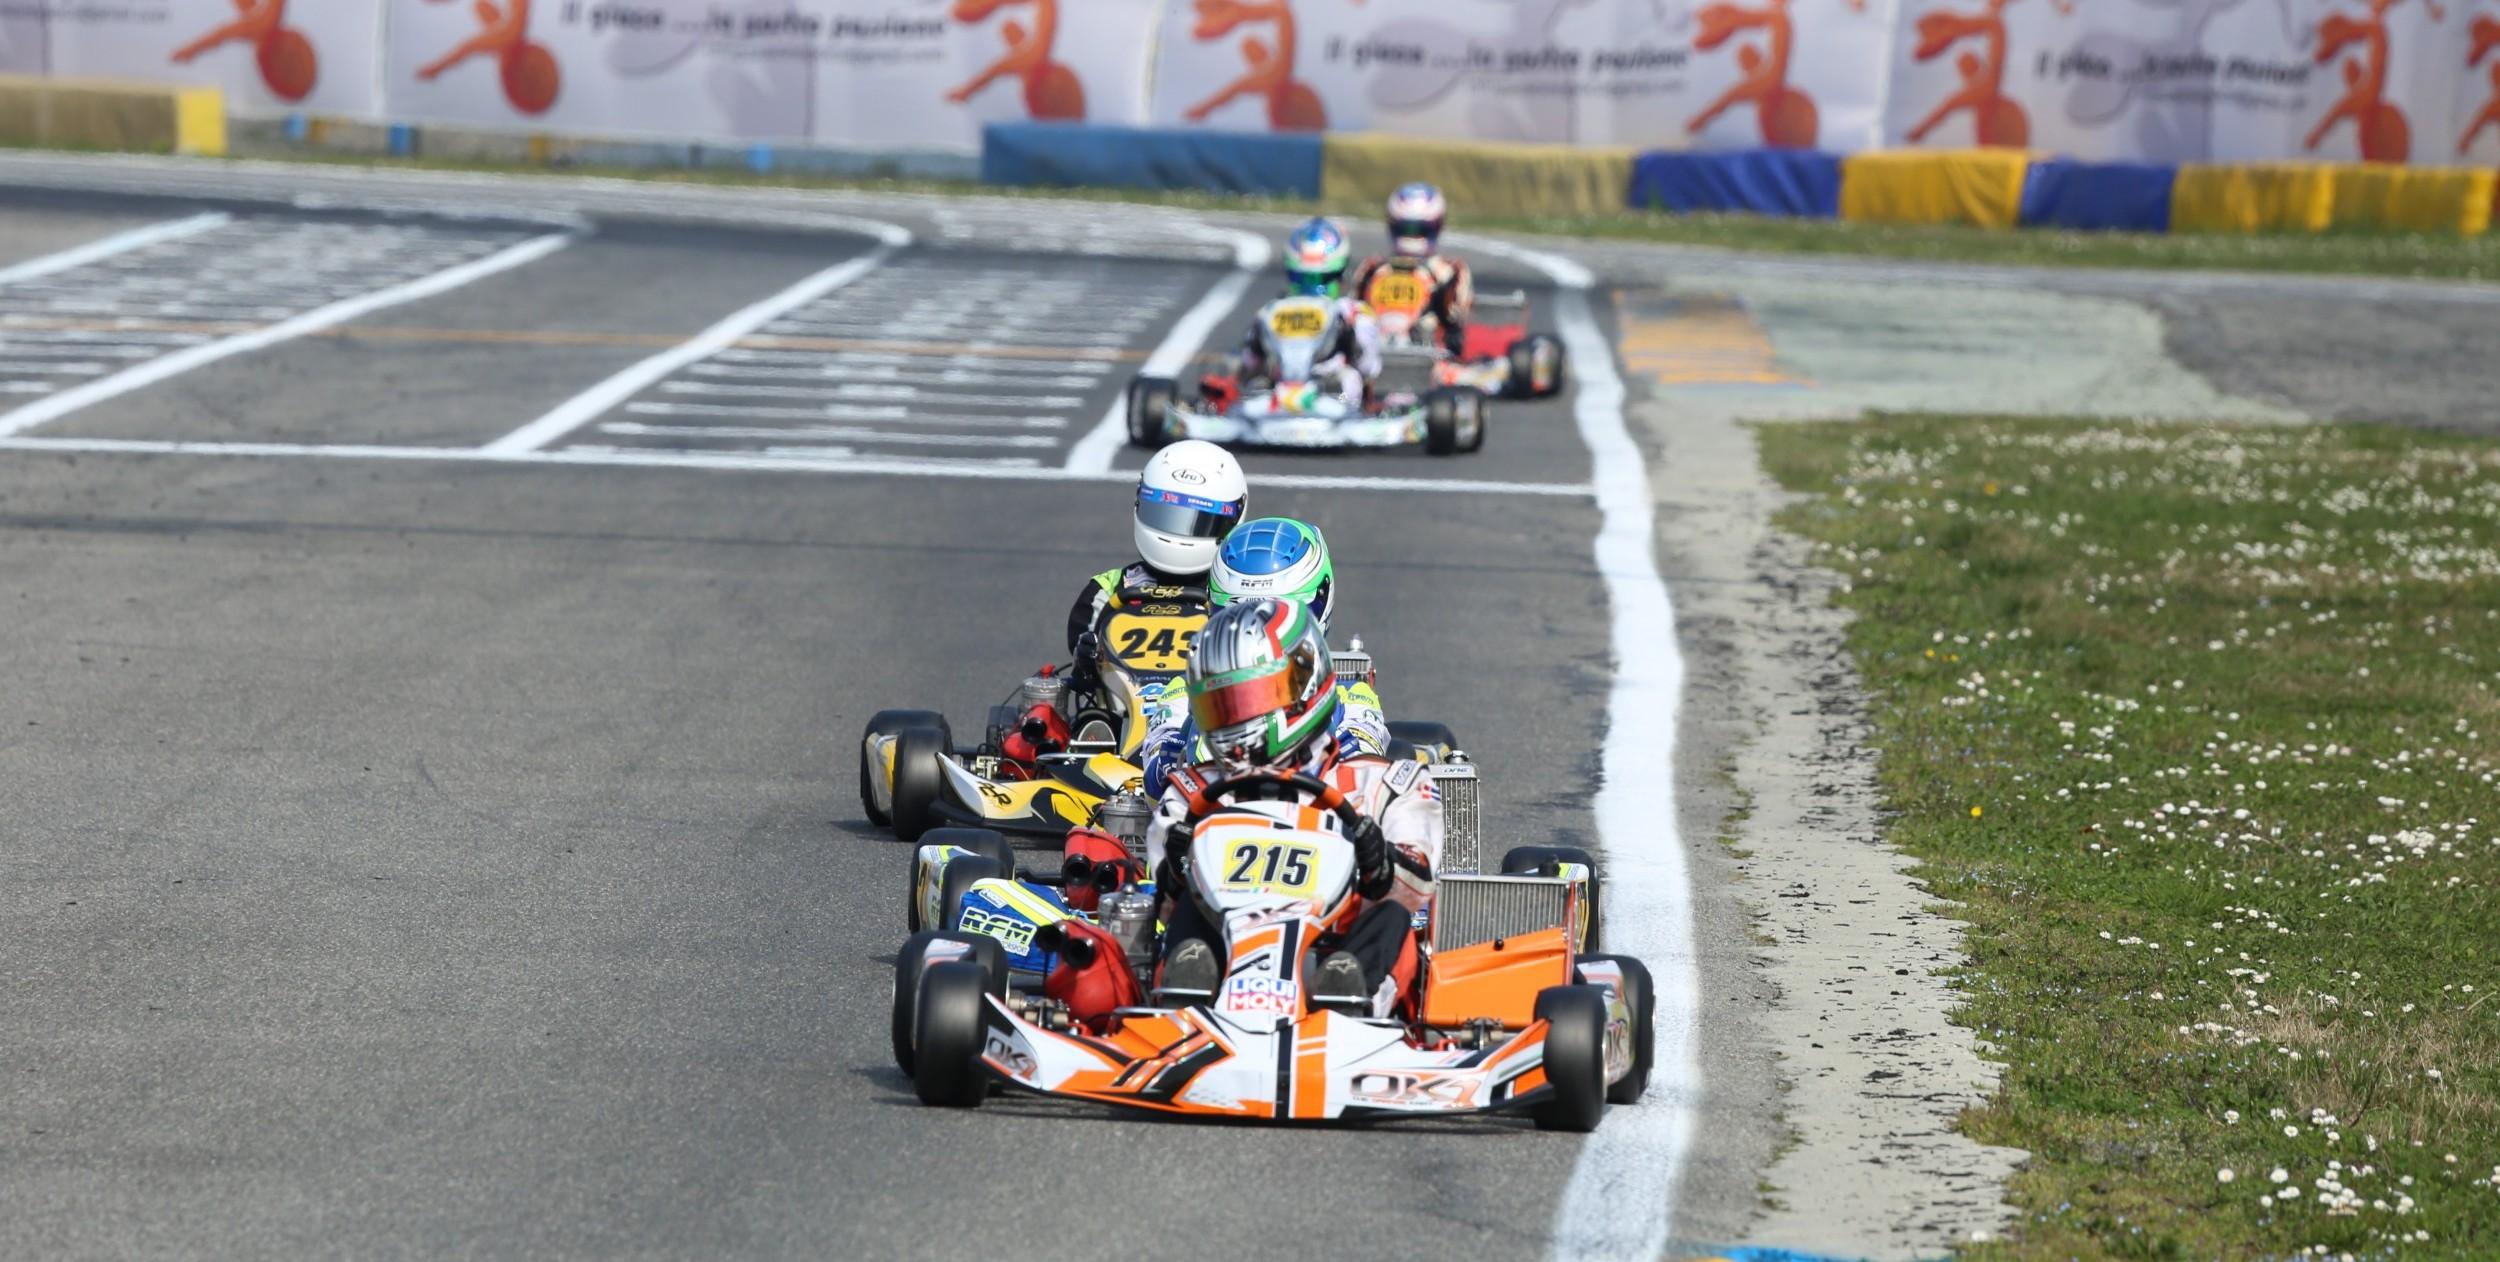 Cruiser-M2 in pista - WSK Master Cup